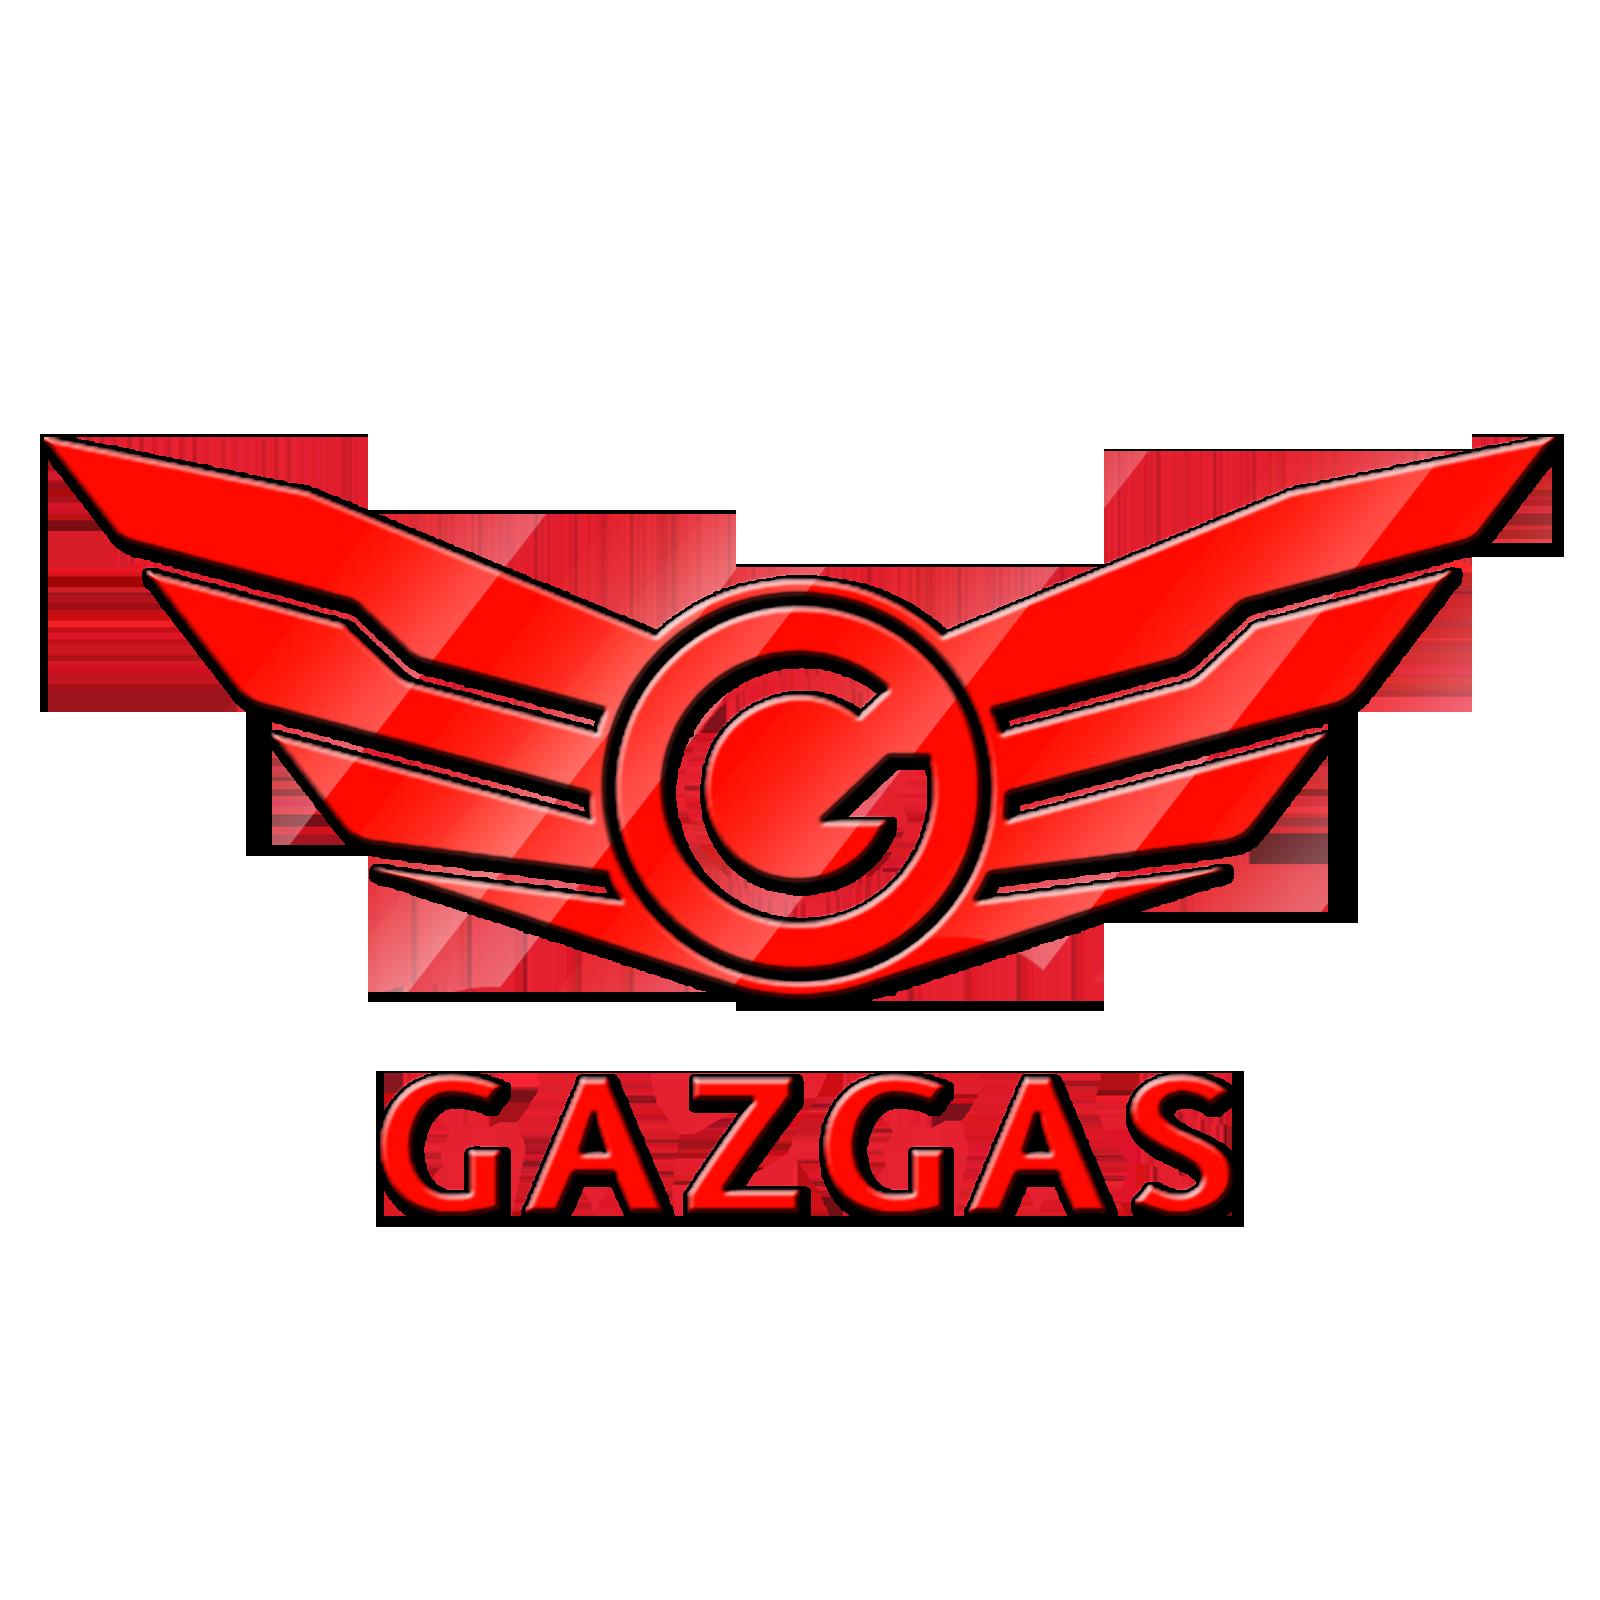 Jual Gazgas Gazelo 125 Sepeda Motor Terbaru Harga Promo November Voucher Rp 7200000